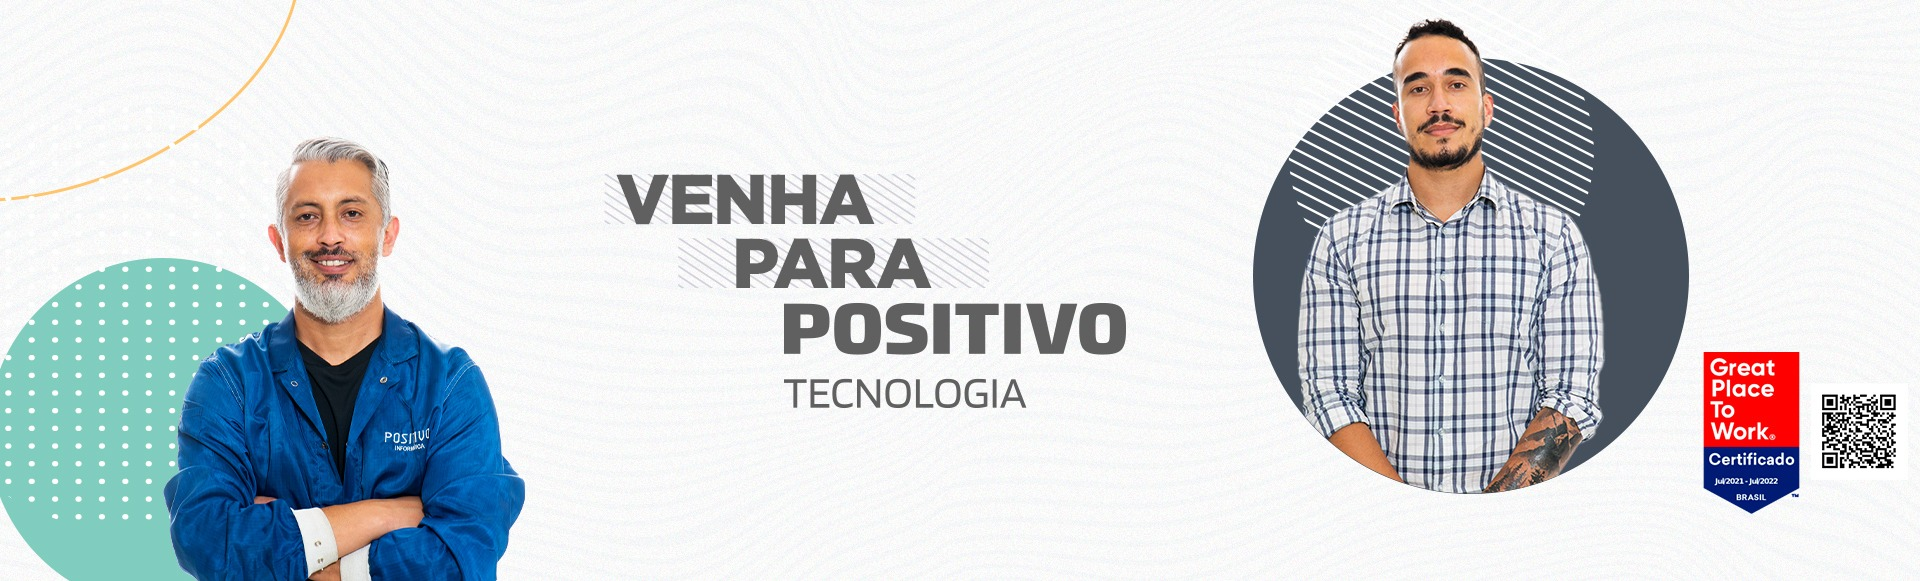 ANALISTA DE ENGENHARIA PL - BOREO - MANAUS